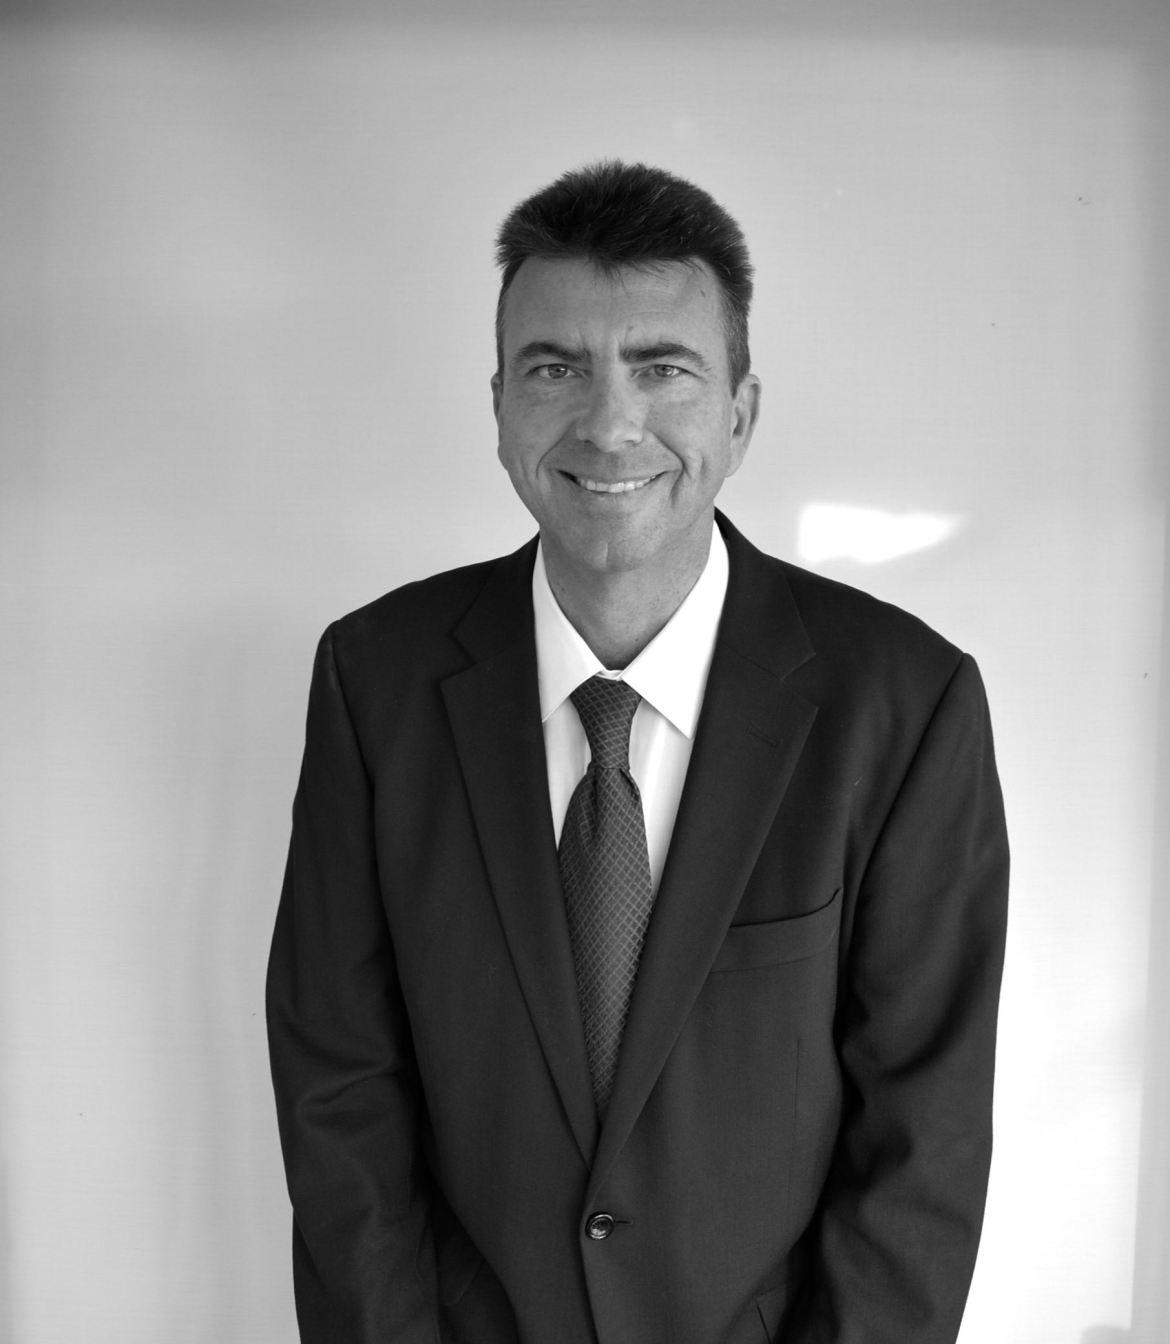 Antonio Bonet Olivella